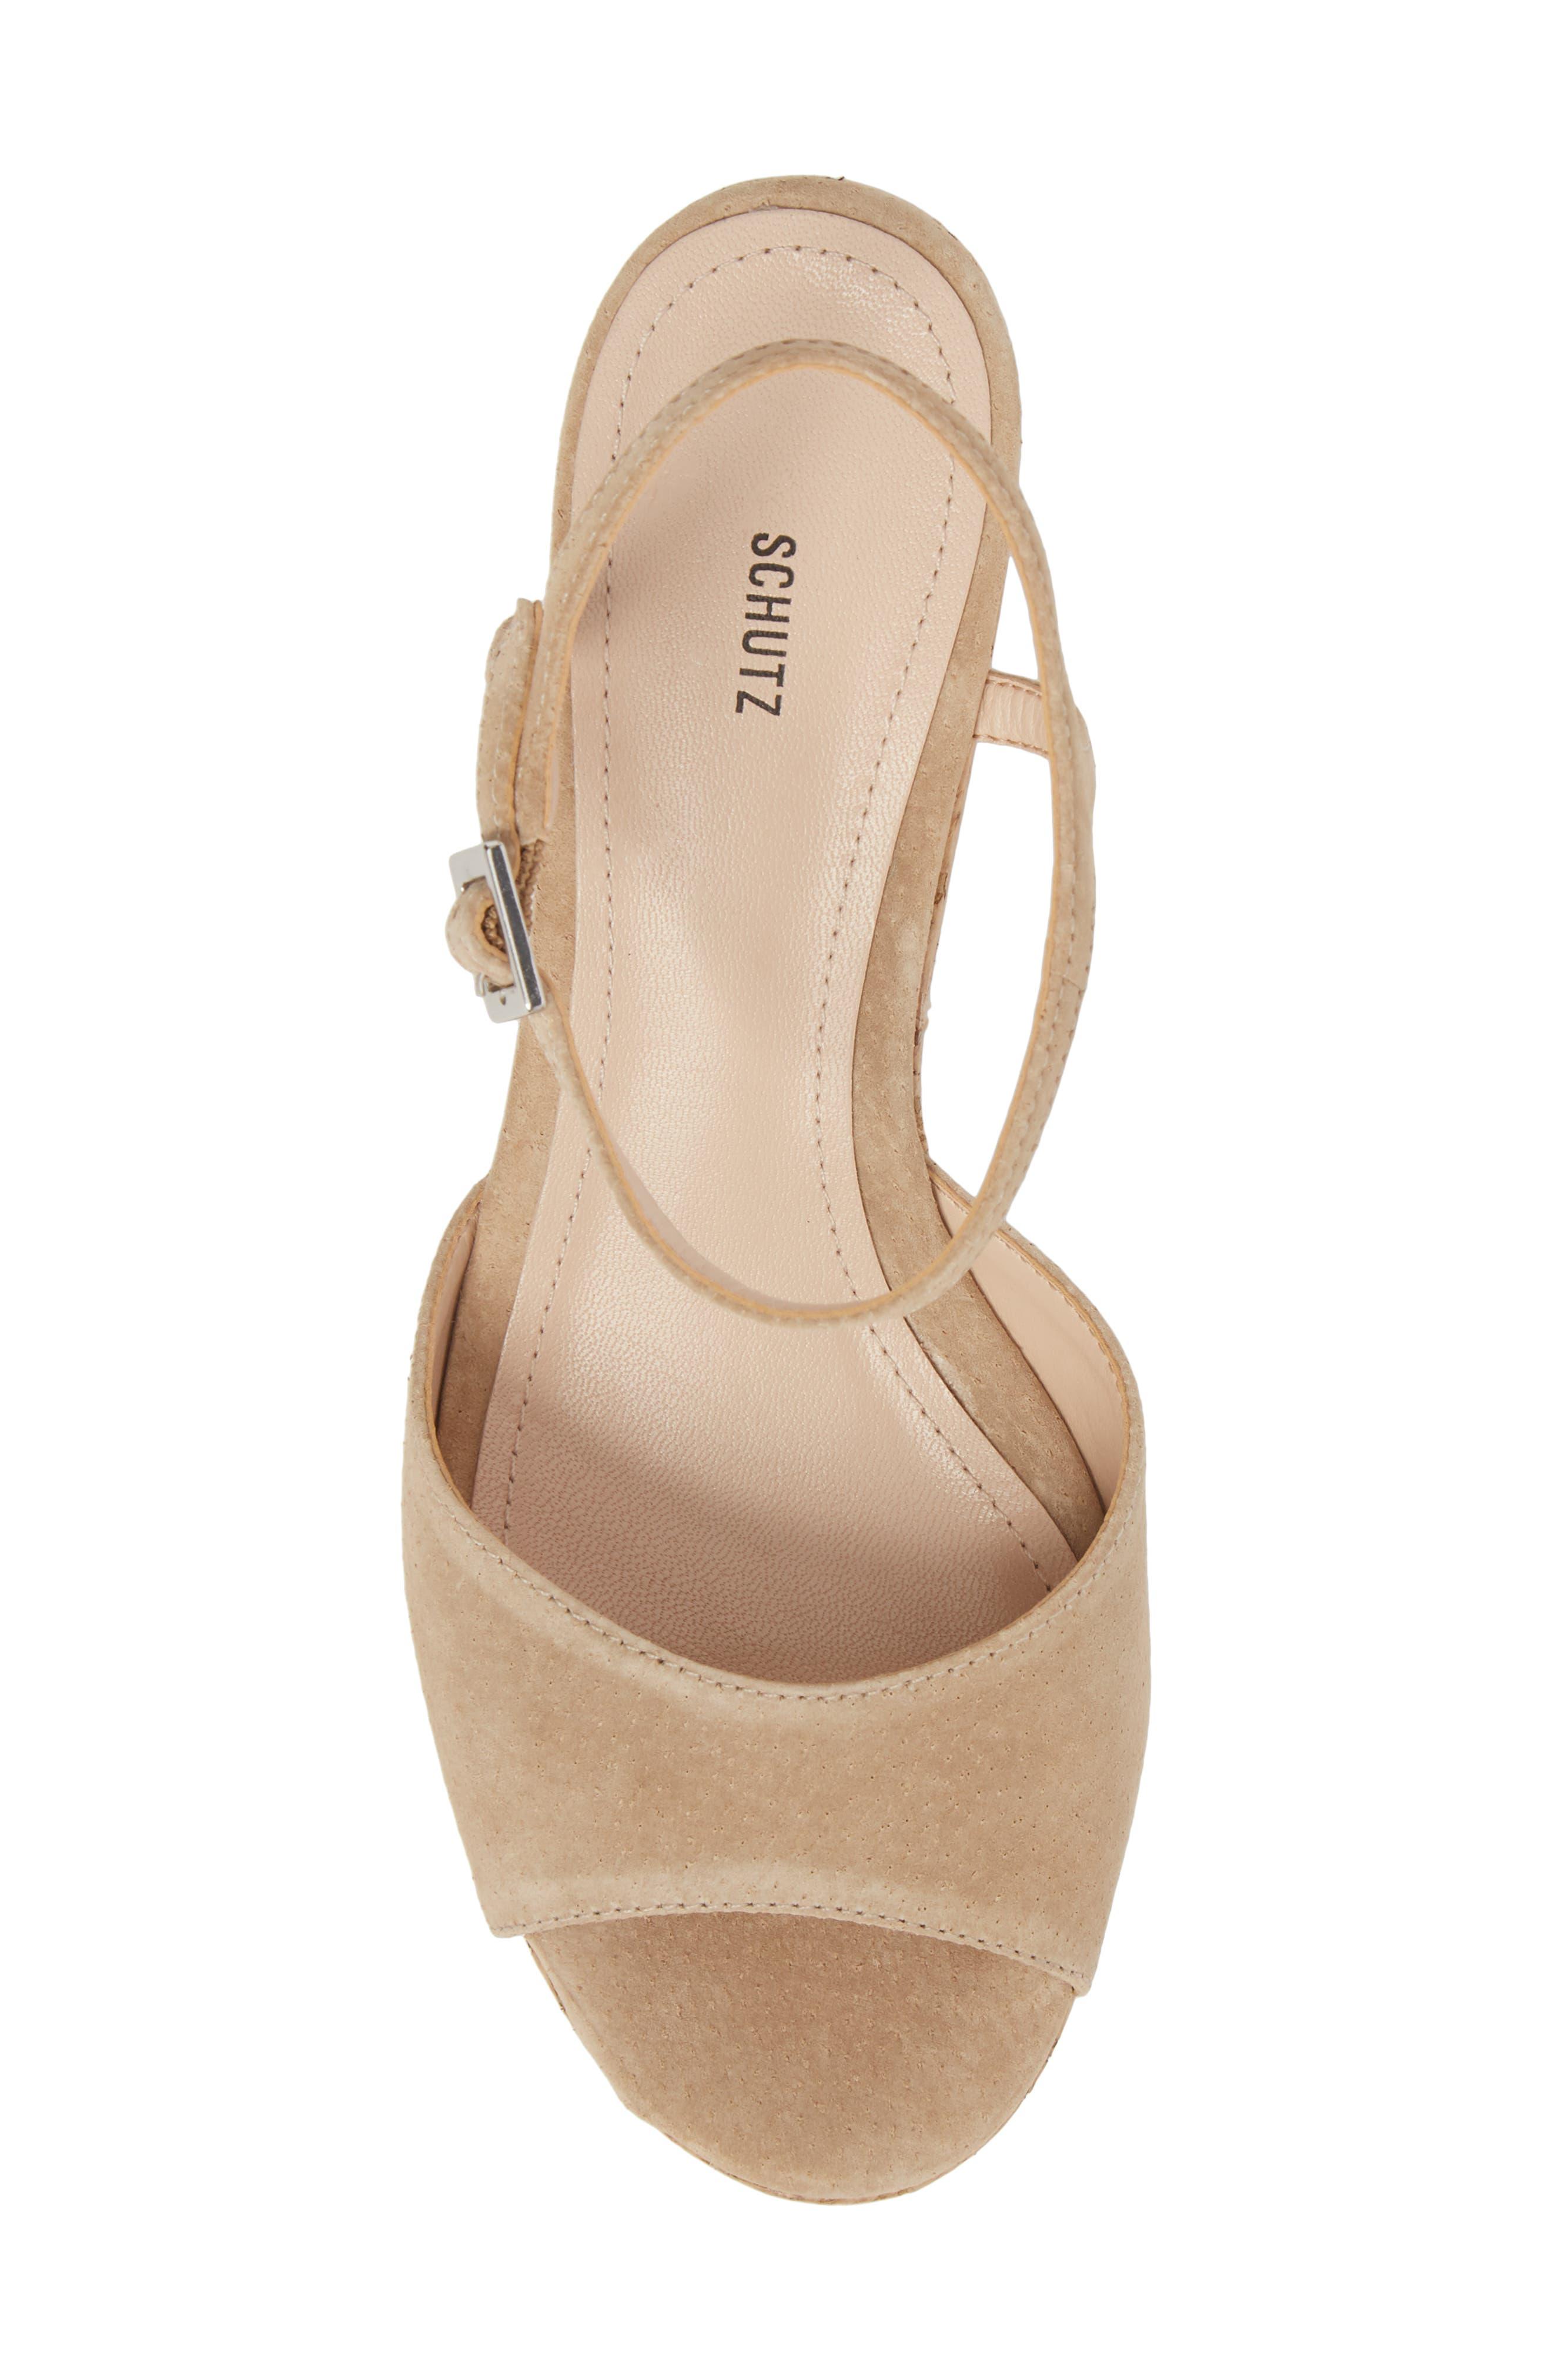 Heloise Platform Wedge Sandal,                             Alternate thumbnail 5, color,                             250